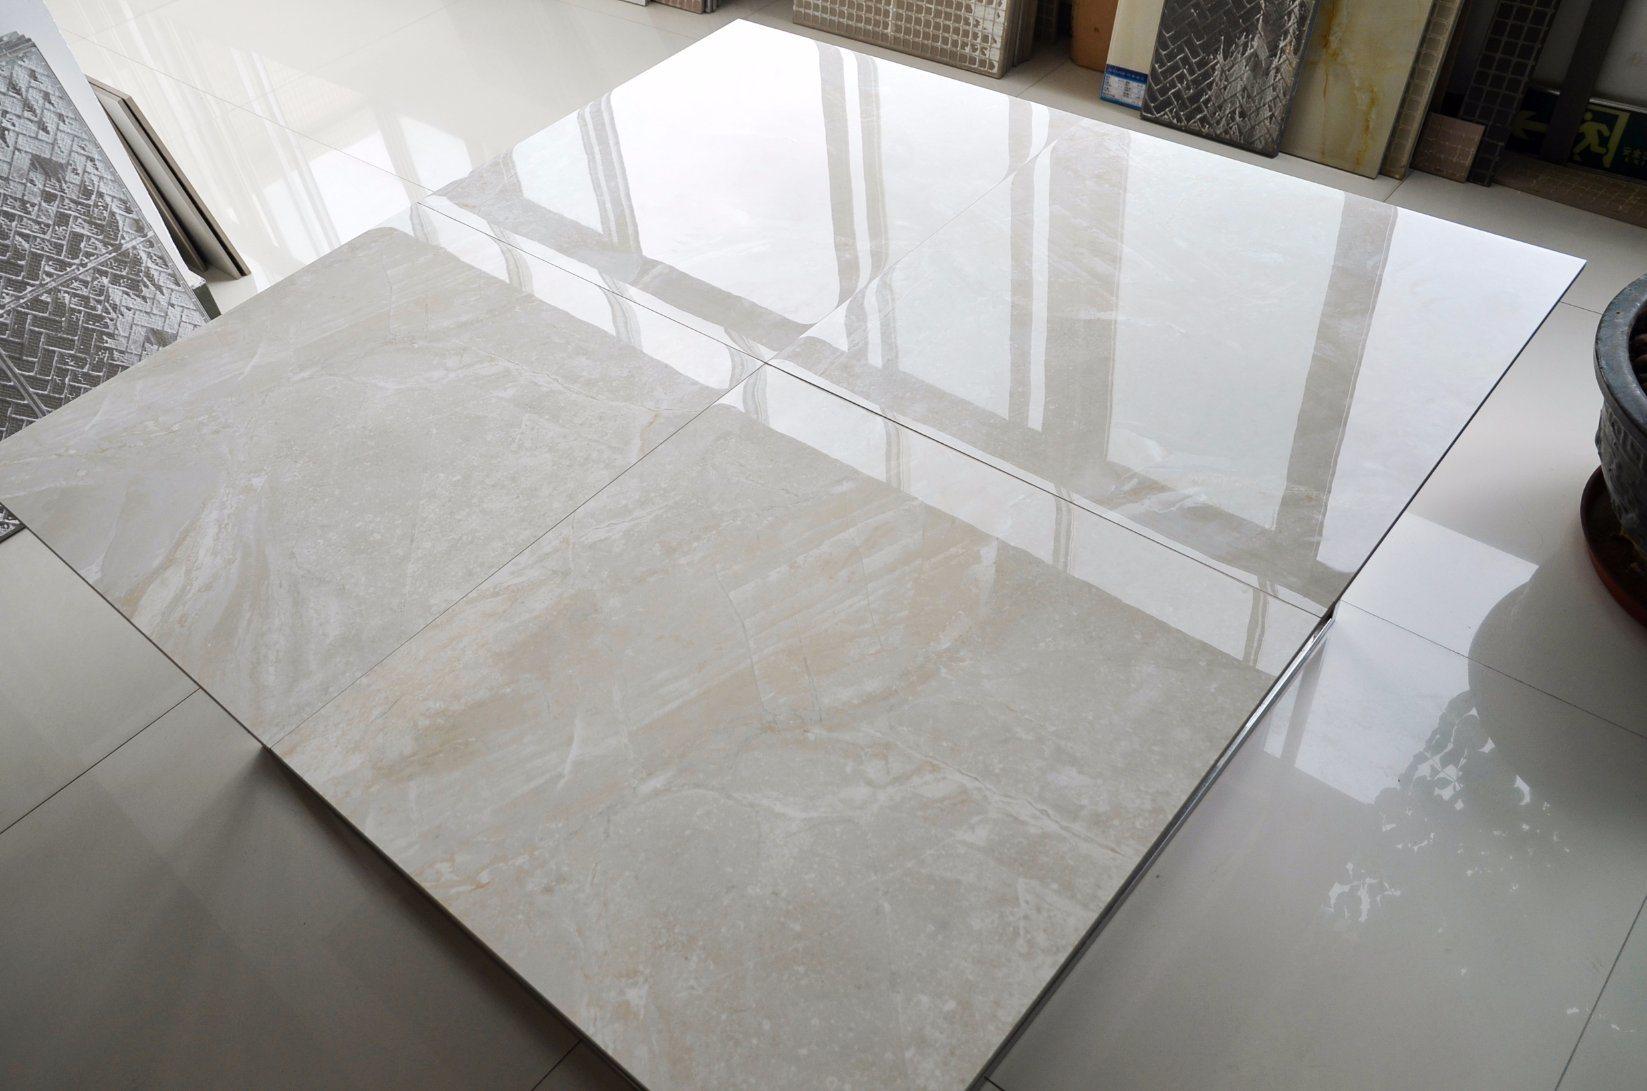 China Building Material in Spanish Porcelain Standard Ceramic Tile ...